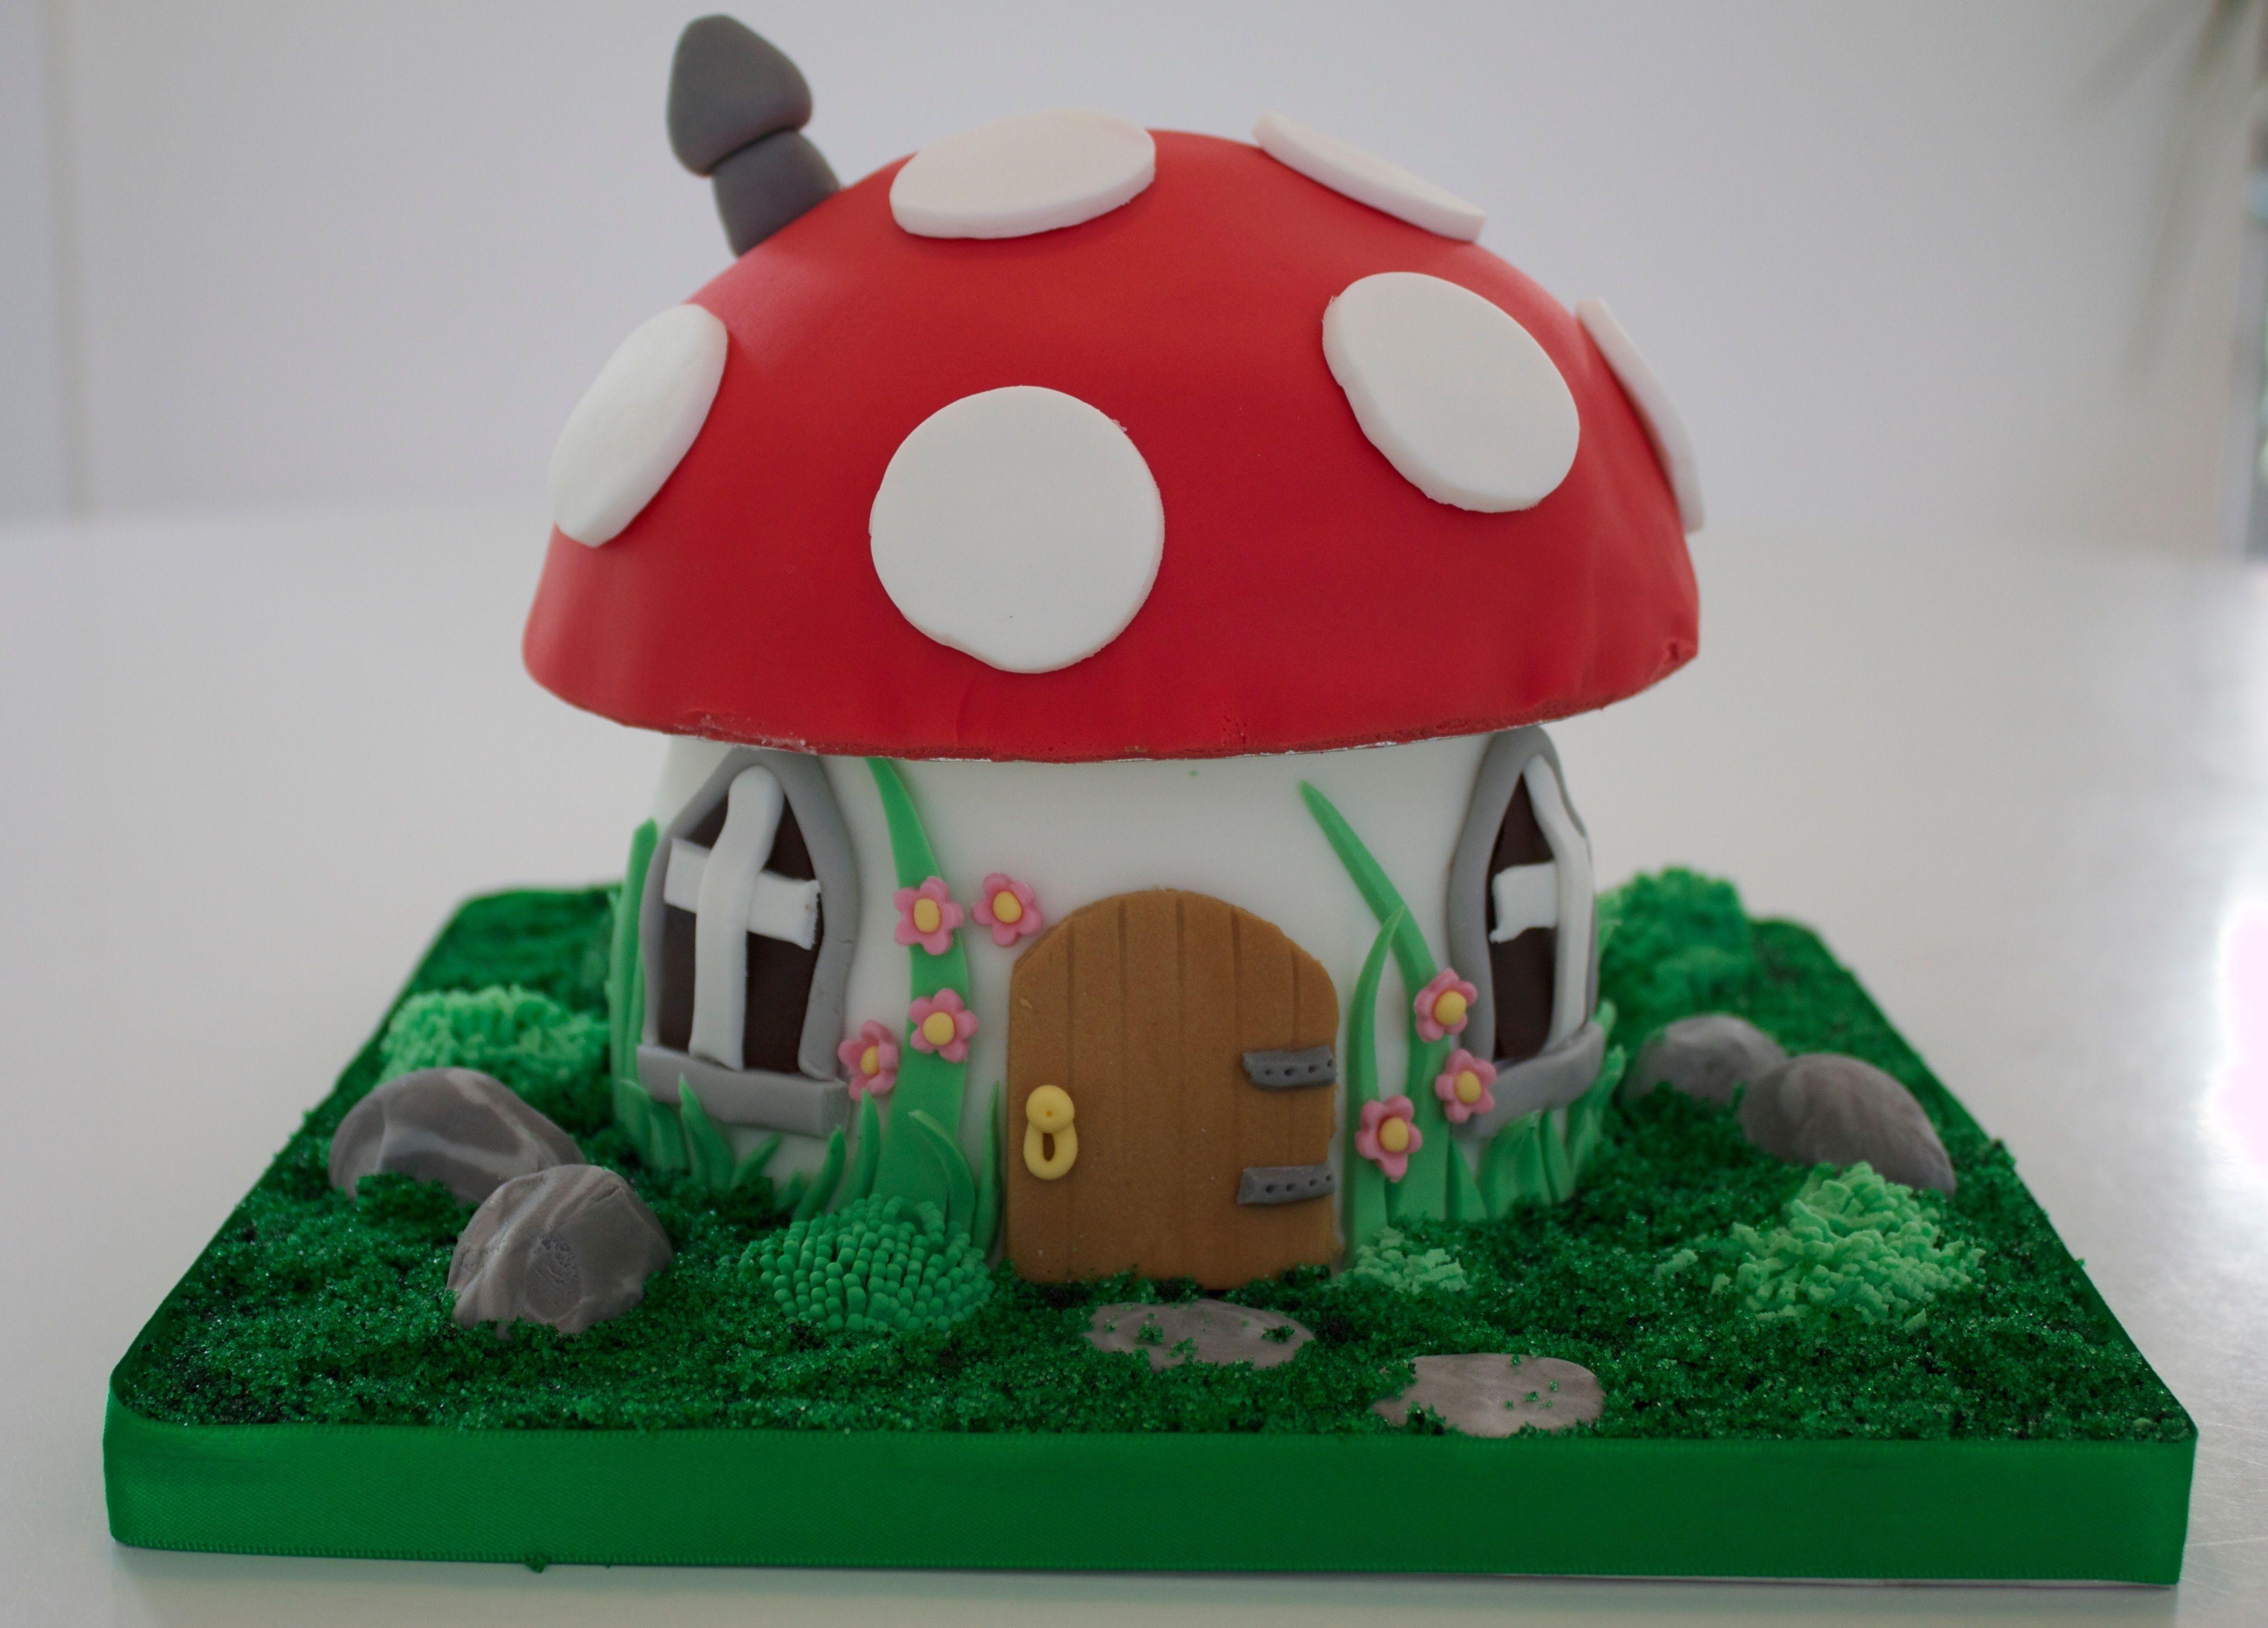 Toadstool house wwwcakesbypennyandsuecouk house cake